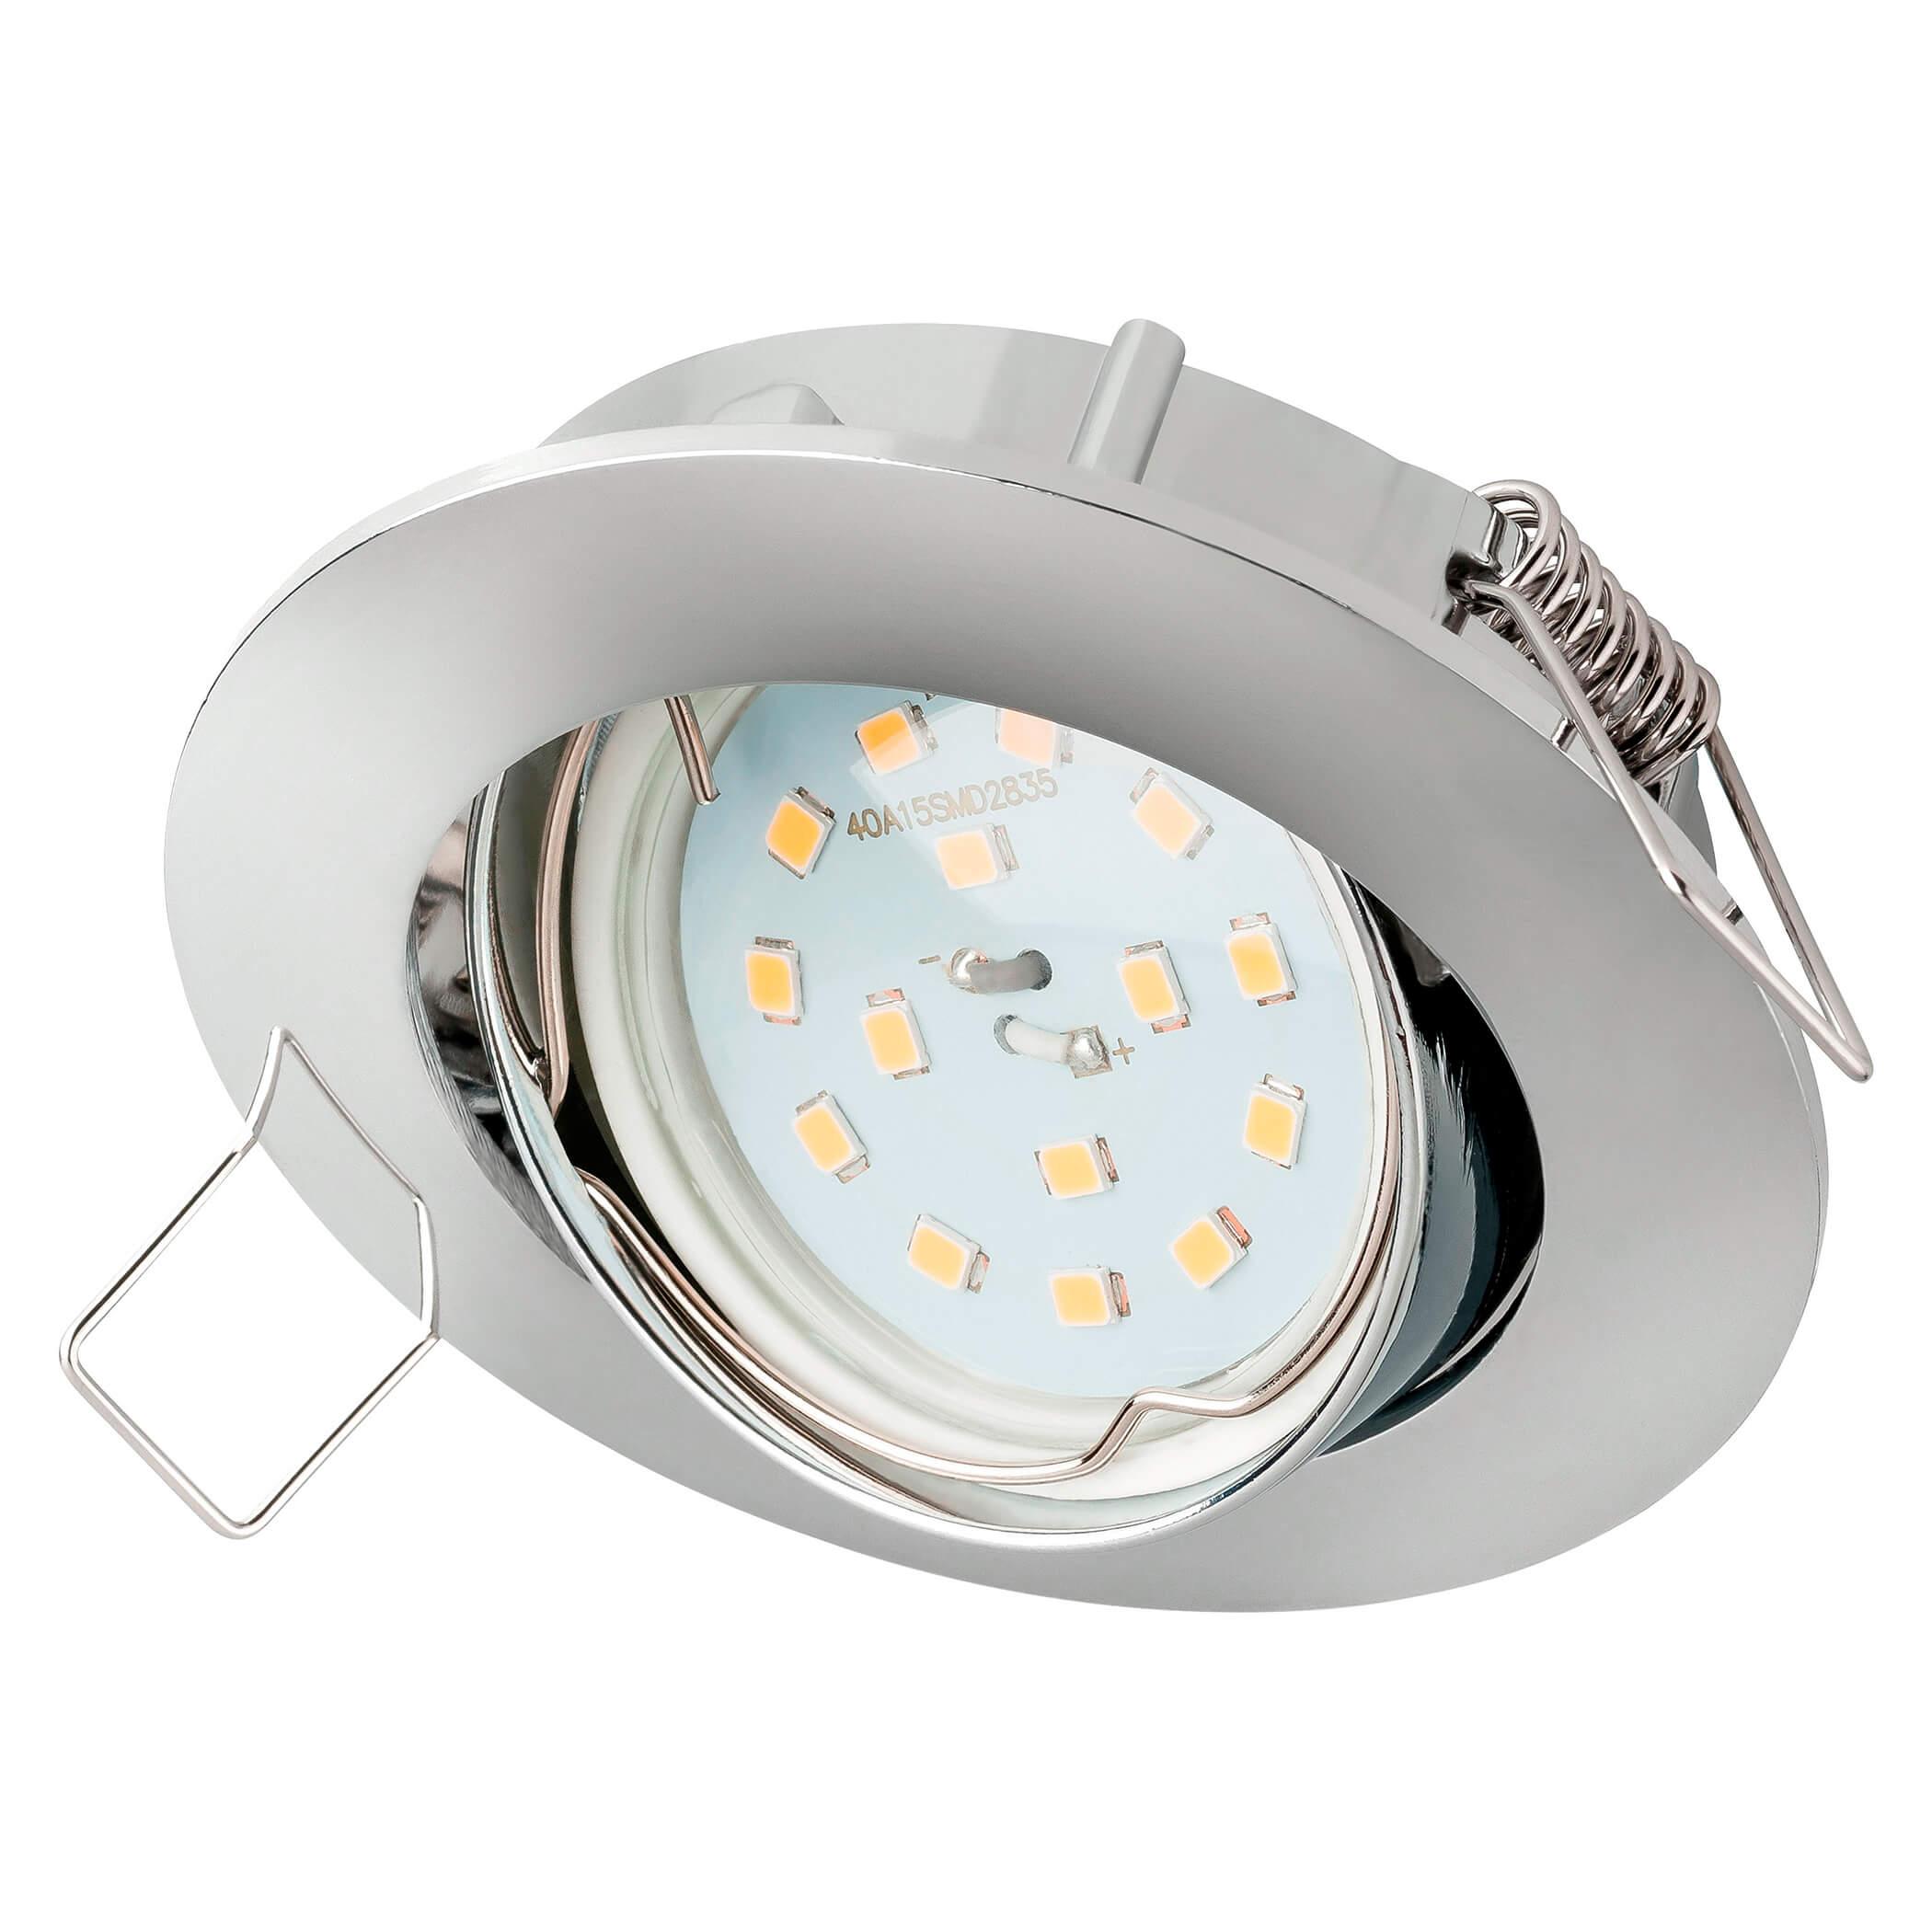 Einbaustrahler mit LED Modul Typ 12